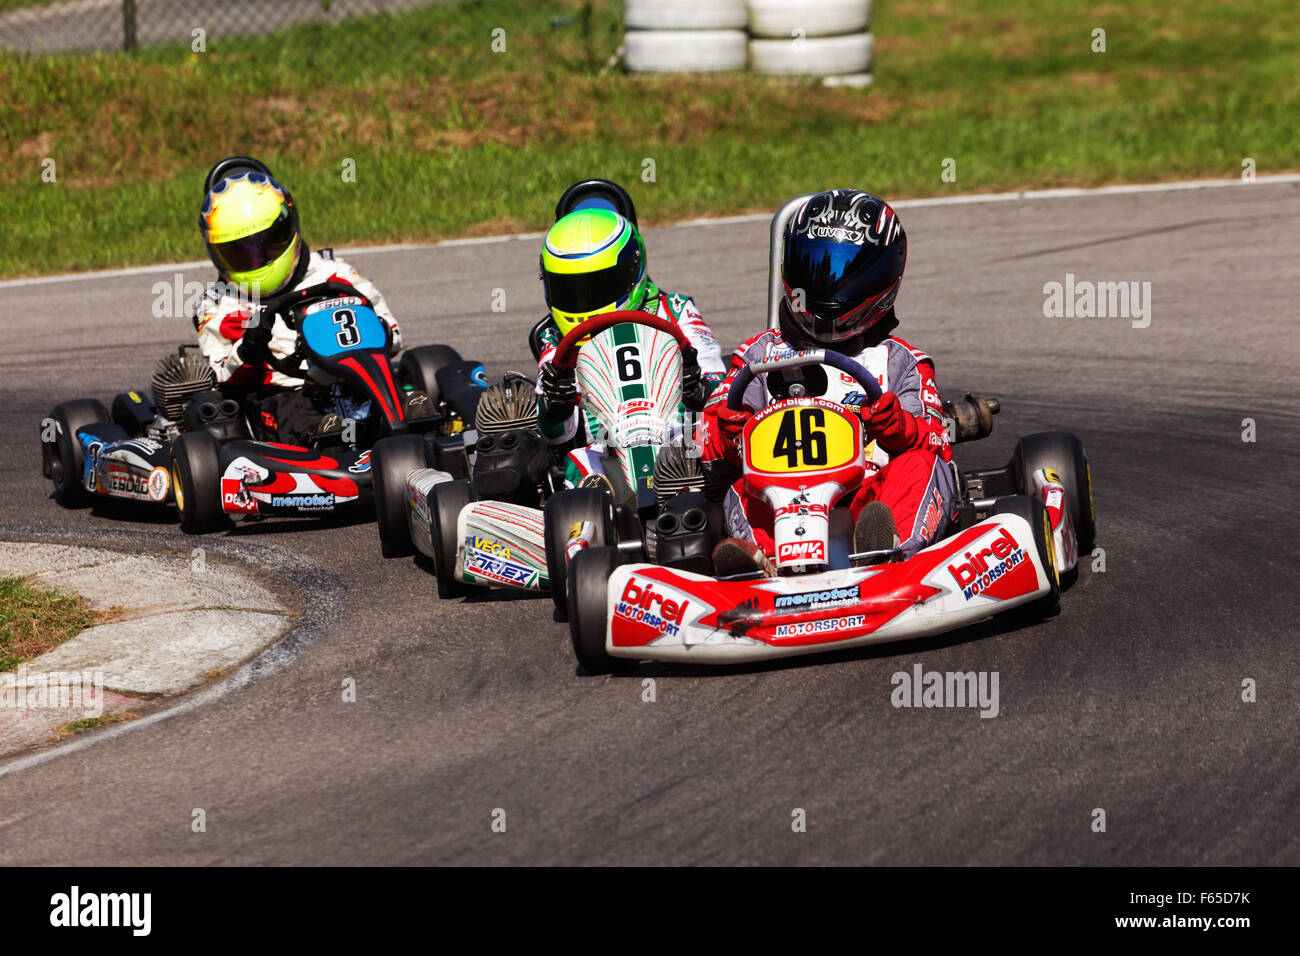 Mick Betsch (No.6), KSM Racing Team, Bambini A, Urloffen, Germany - Stock Image